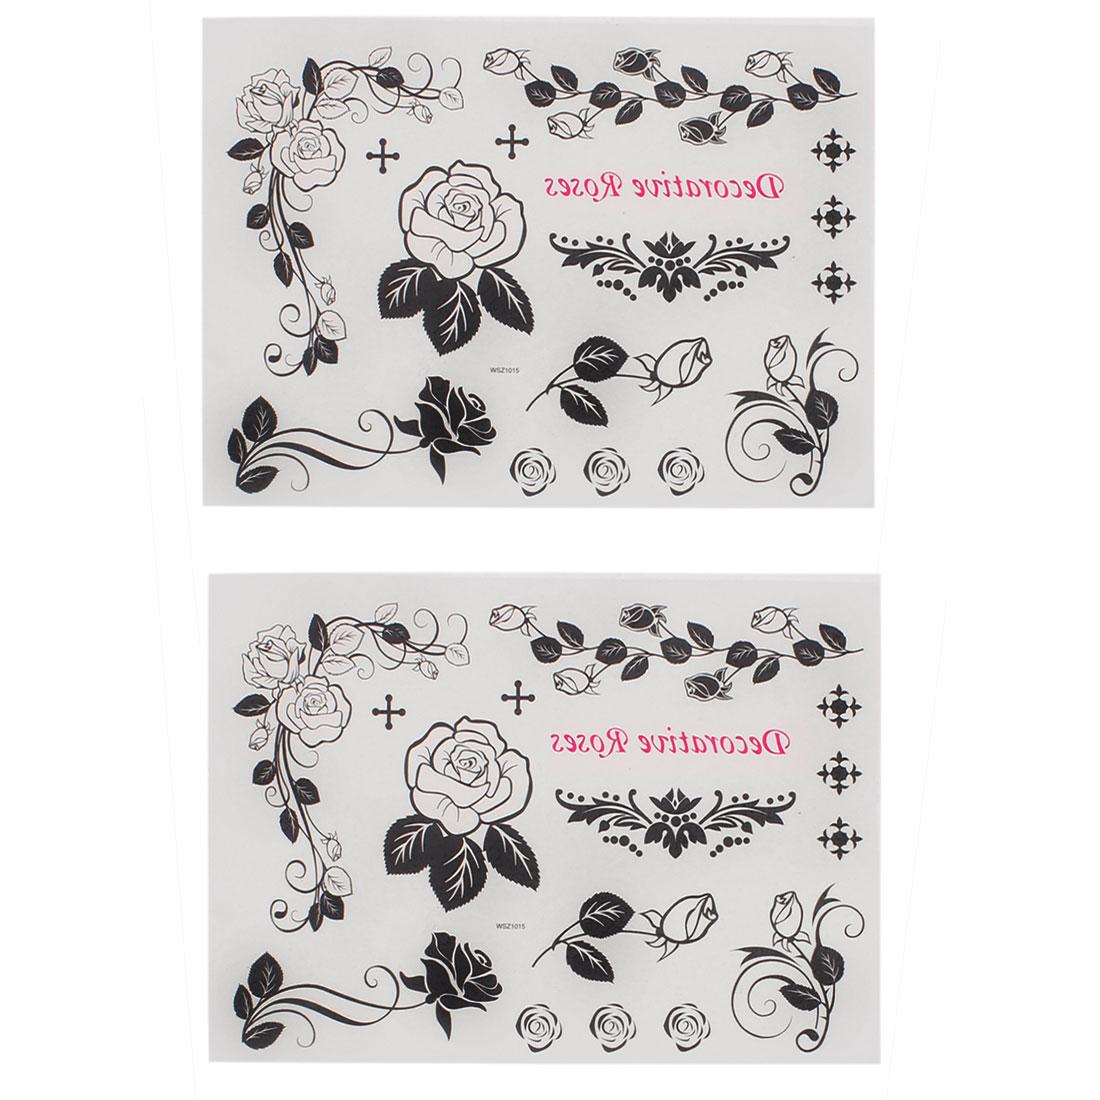 2 pieces Rose Print Body Art Removable Sticker Temporary Tattoos